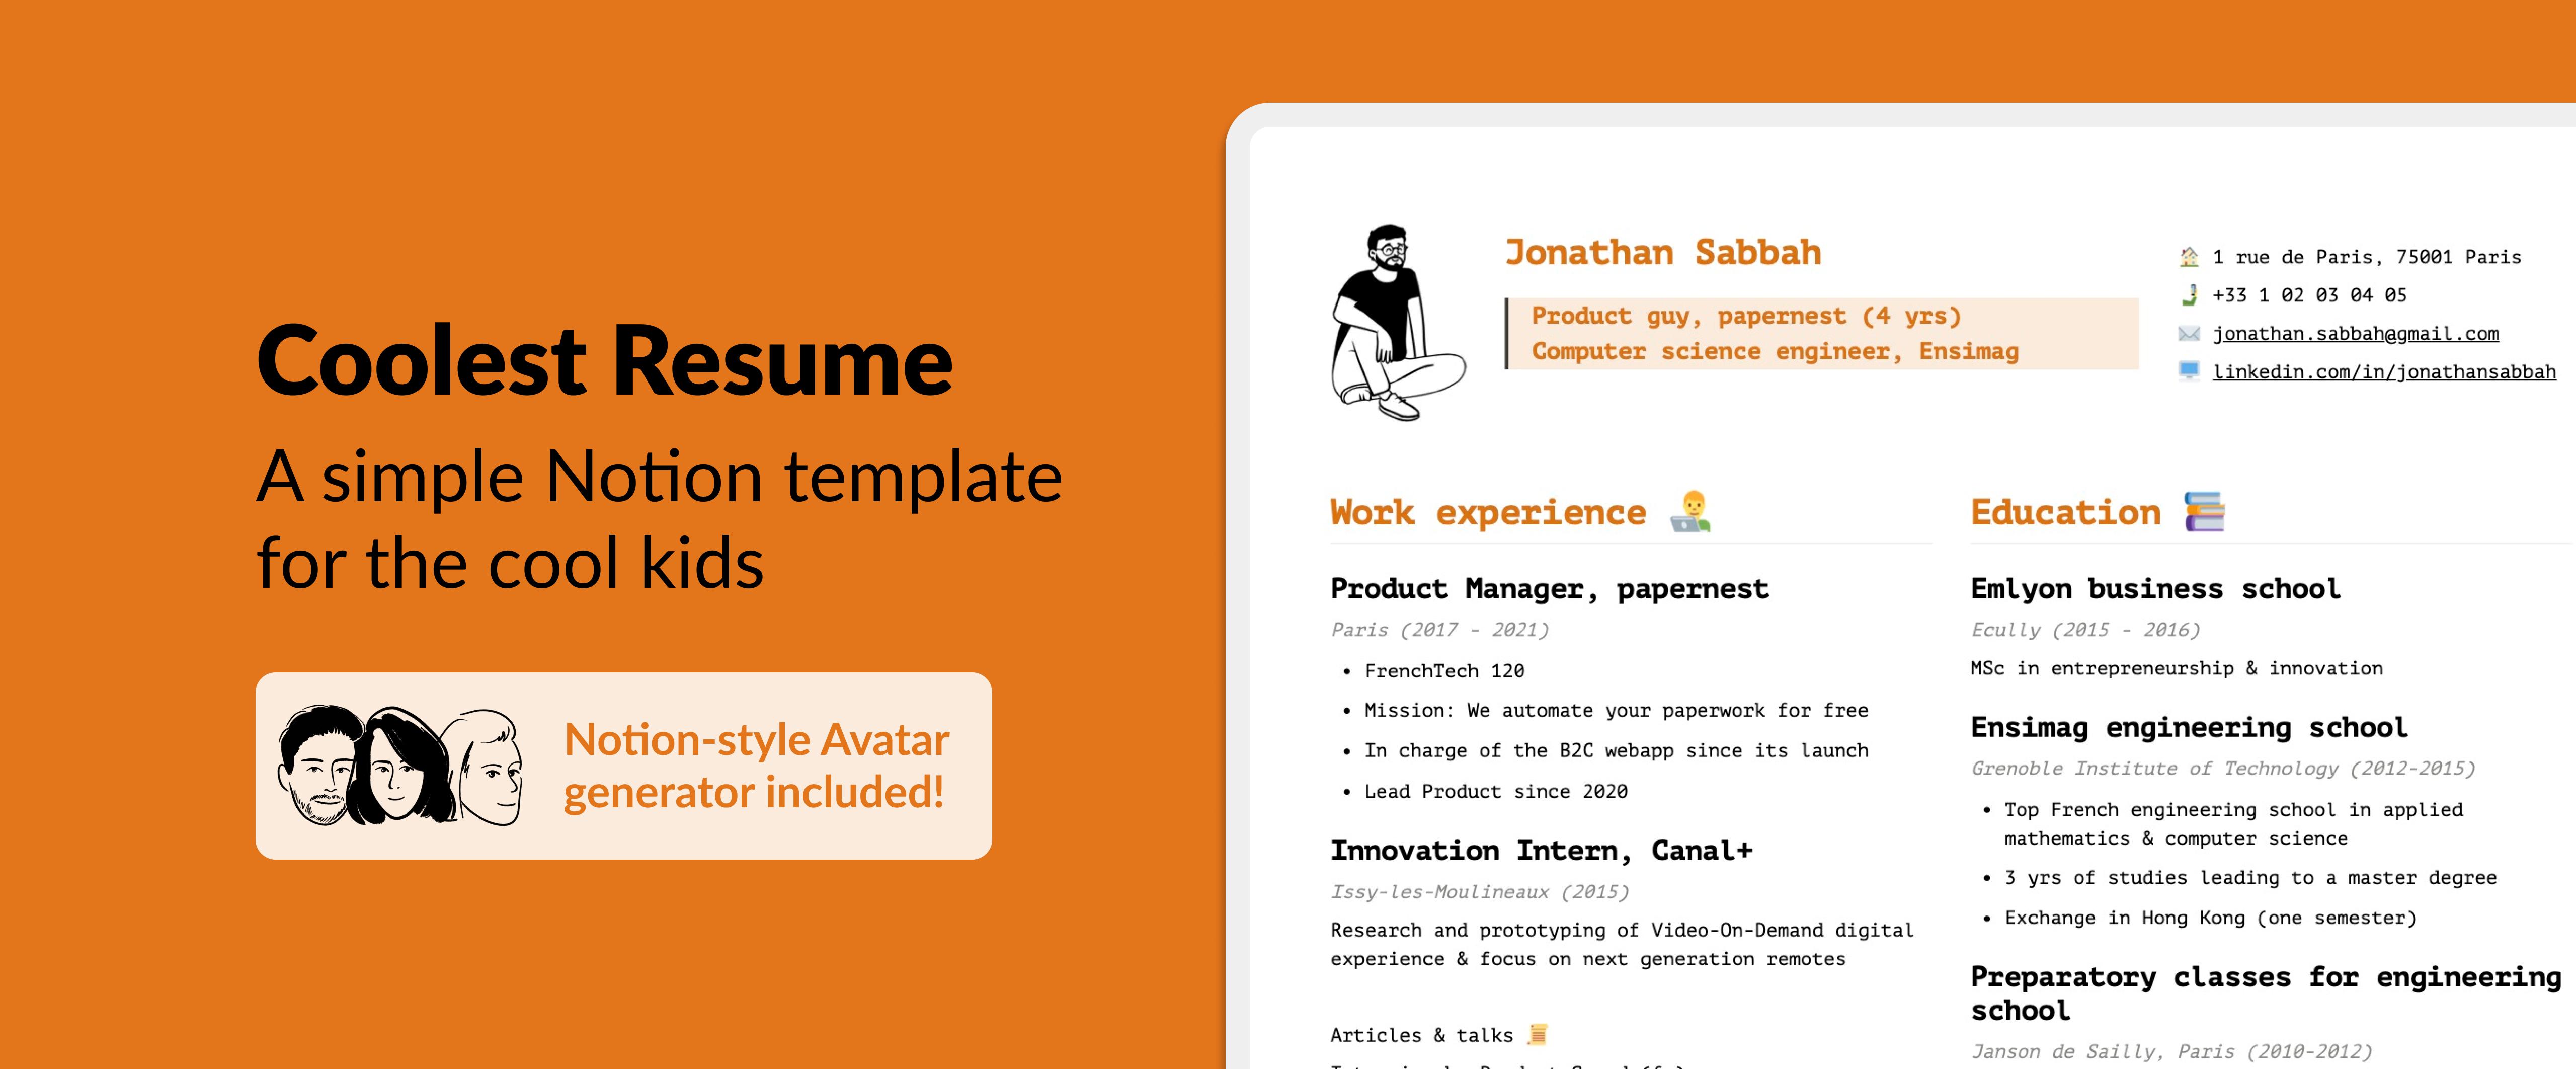 Coolest Resume CV - Notion template